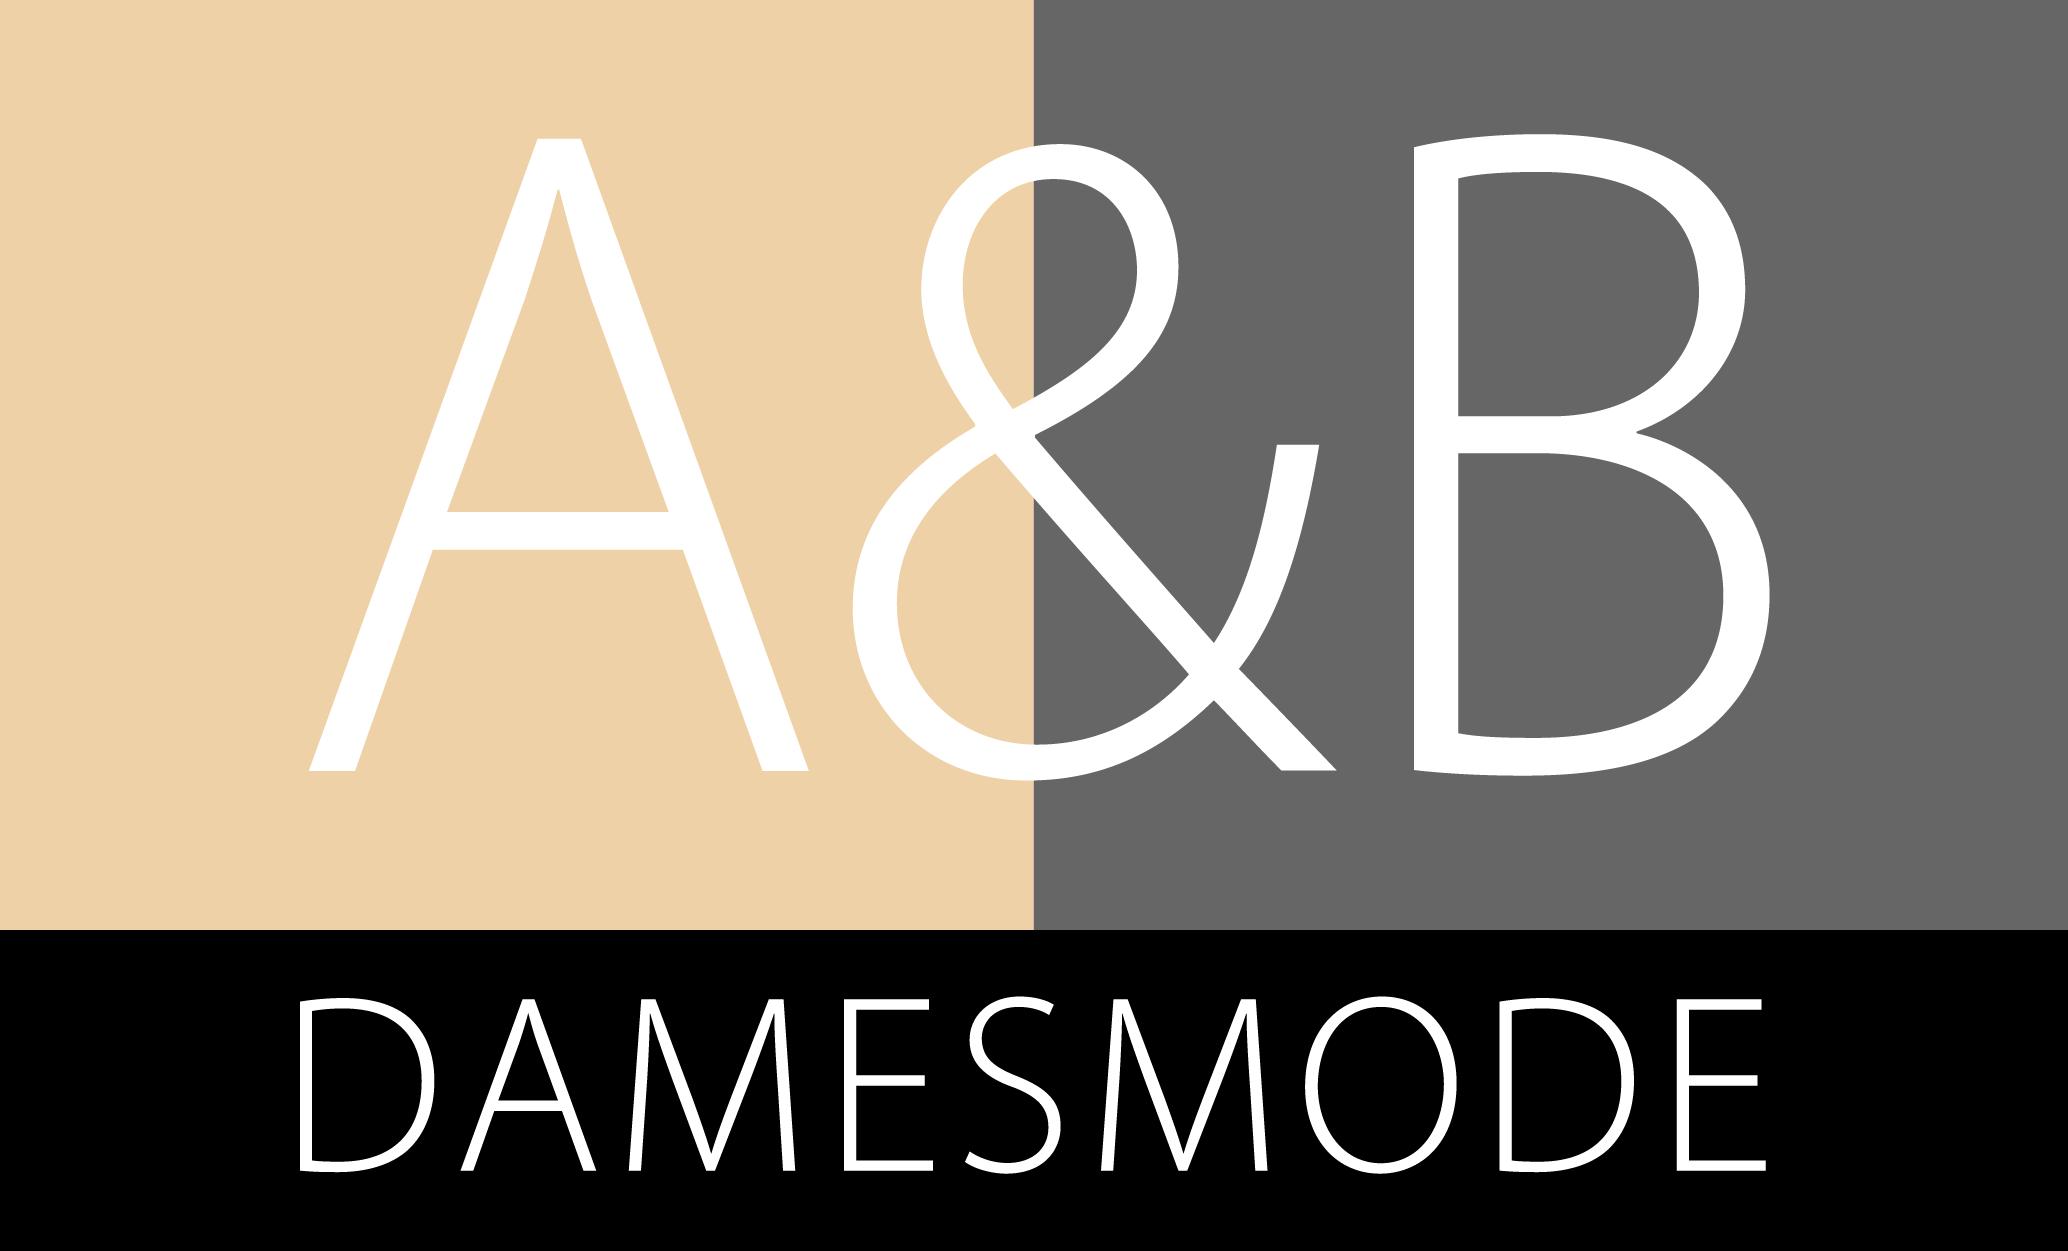 A&B Damesmode